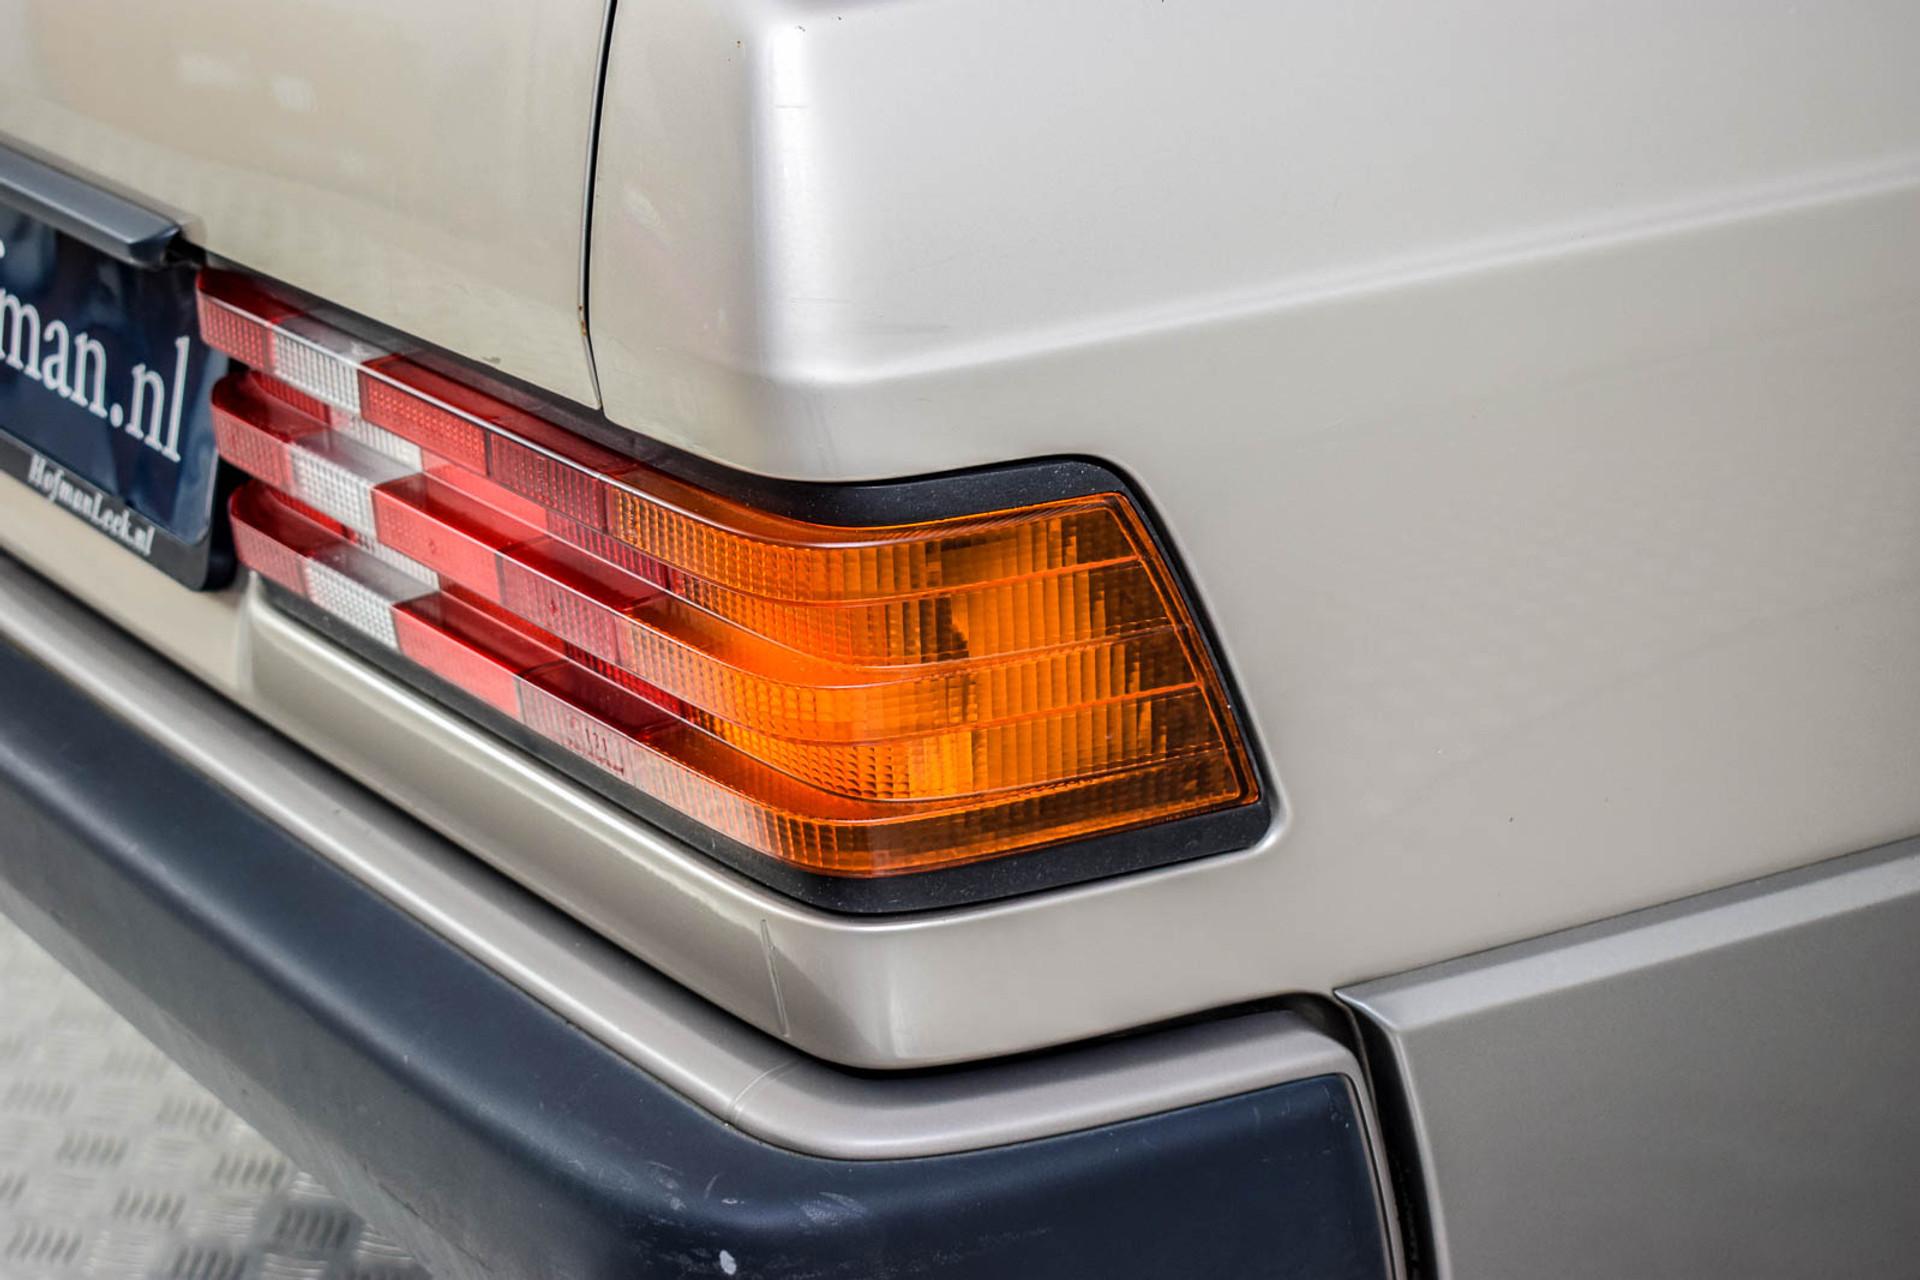 Mercedes-Benz 190 2.5 D Turbo Diesel Foto 23